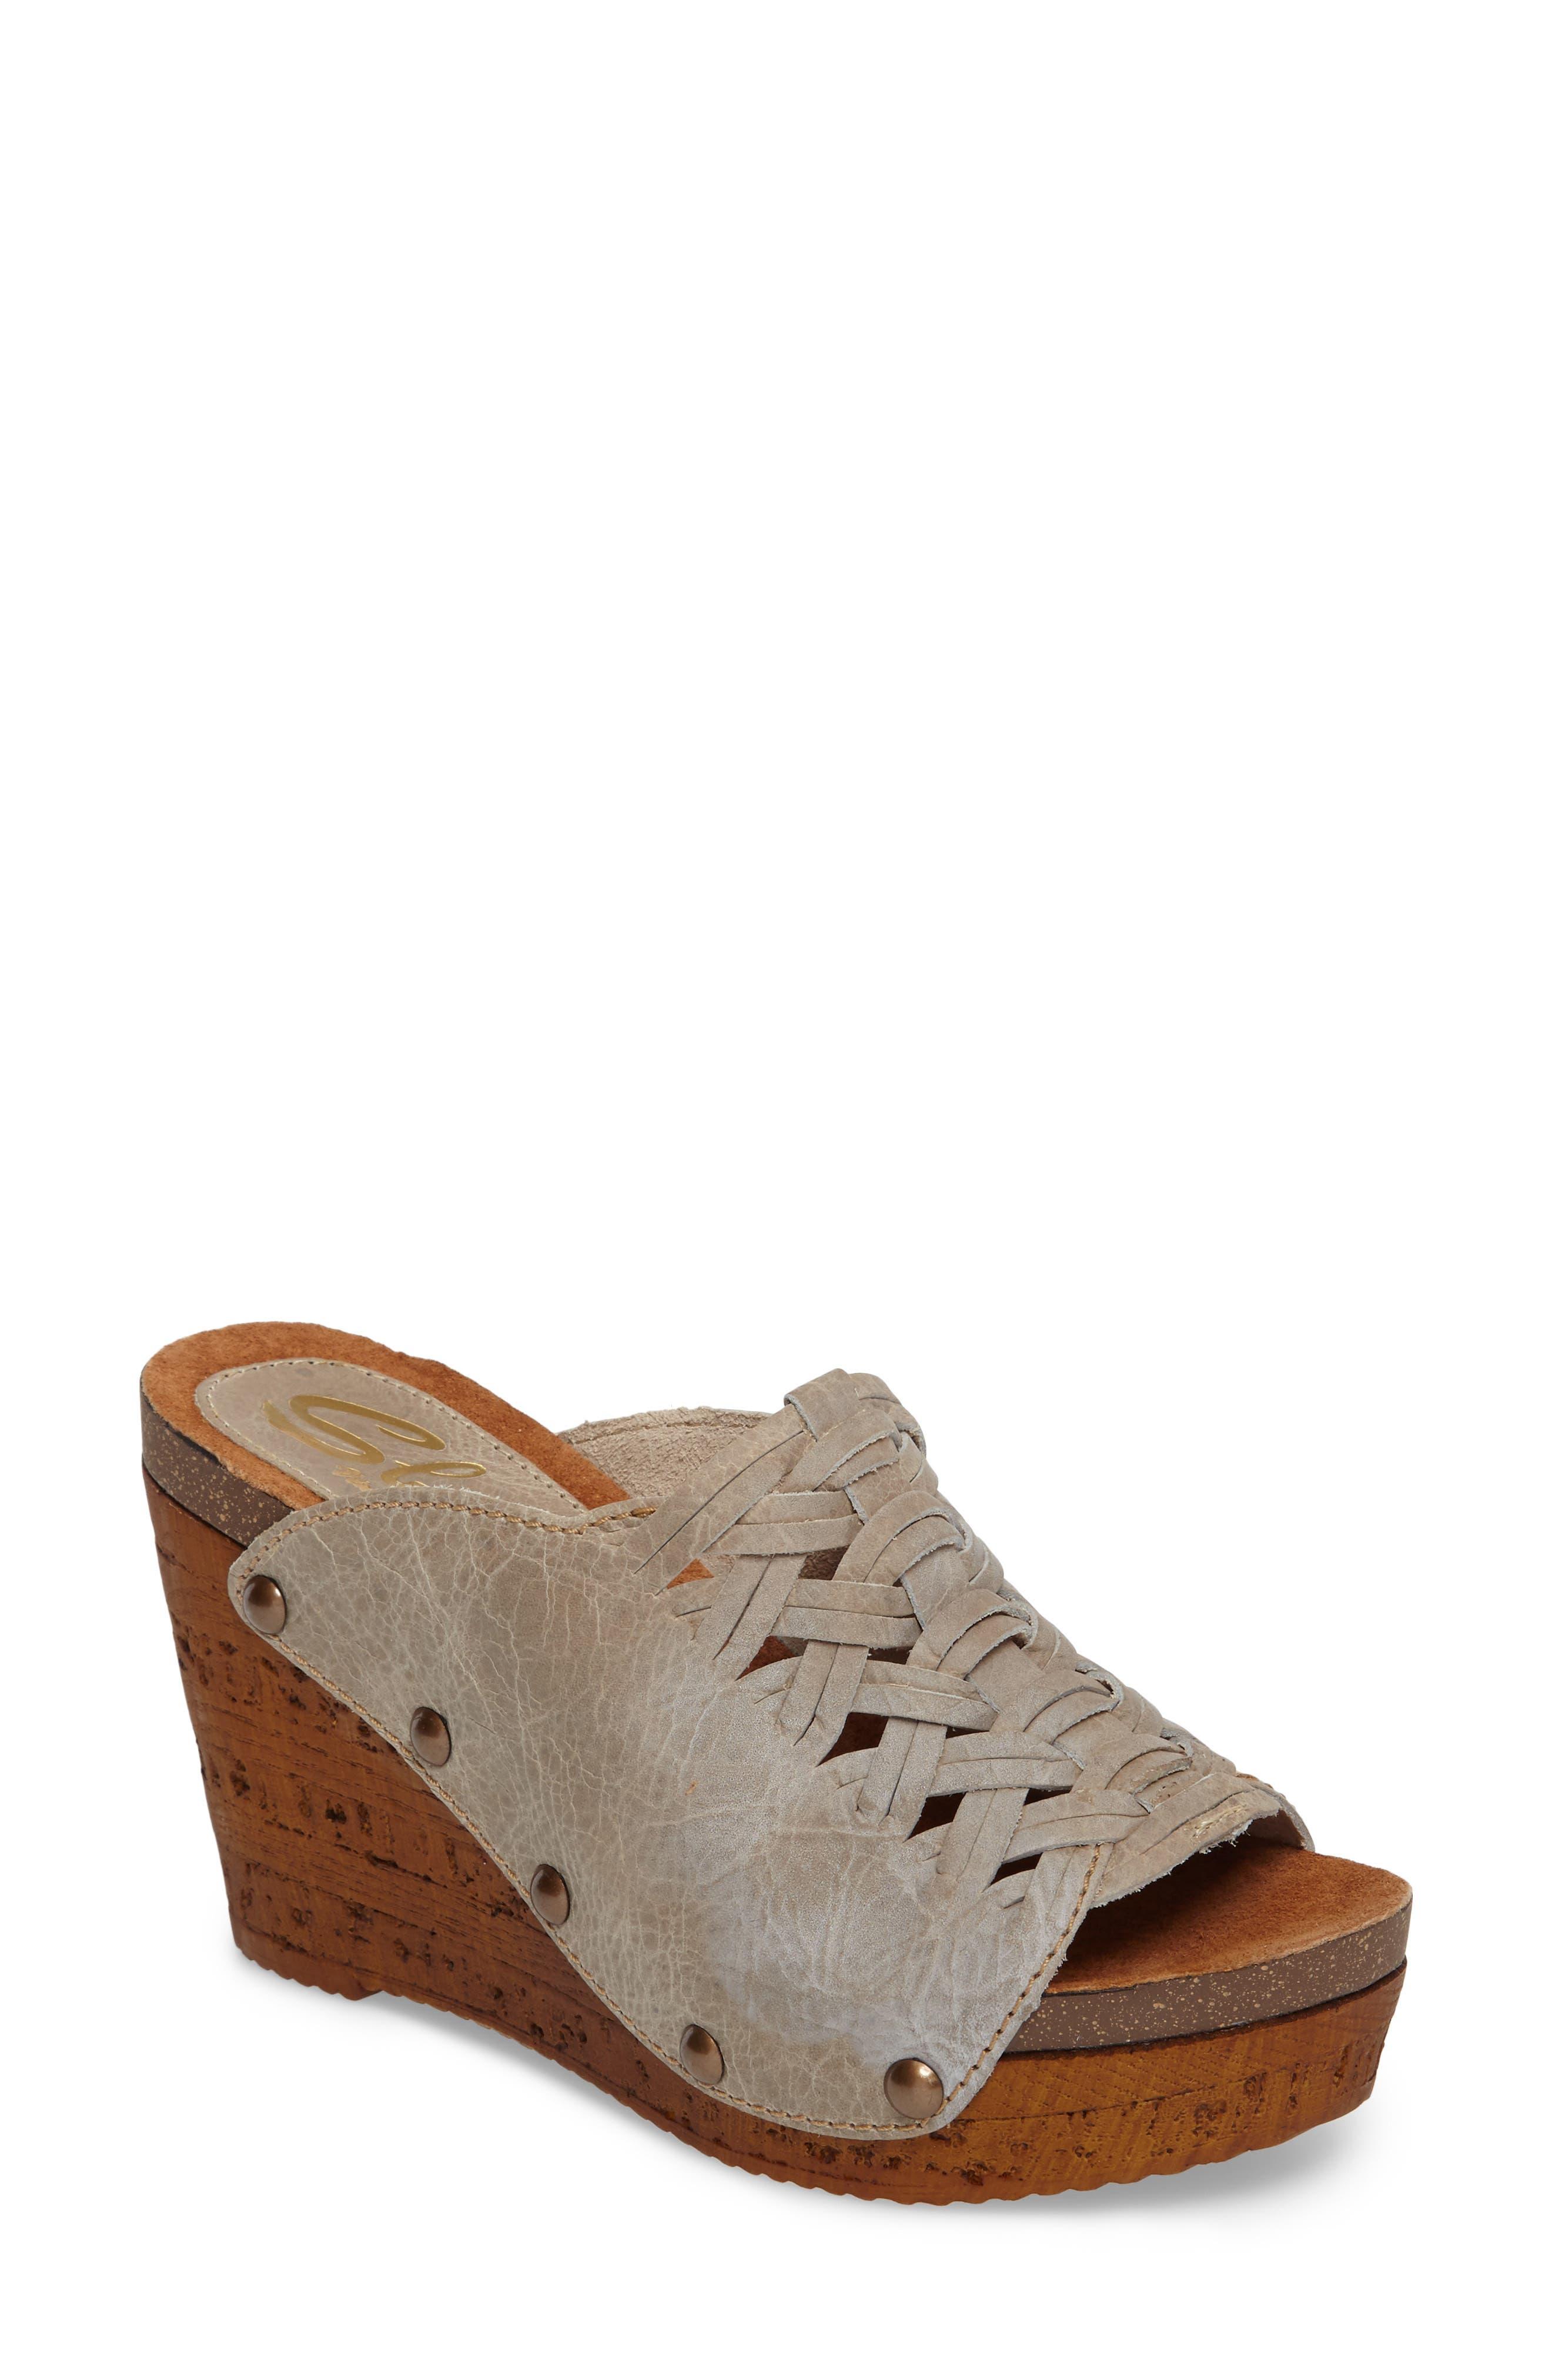 Alternate Image 1 Selected - Sbicca Genesis Platform Wedge Sandal (Women)